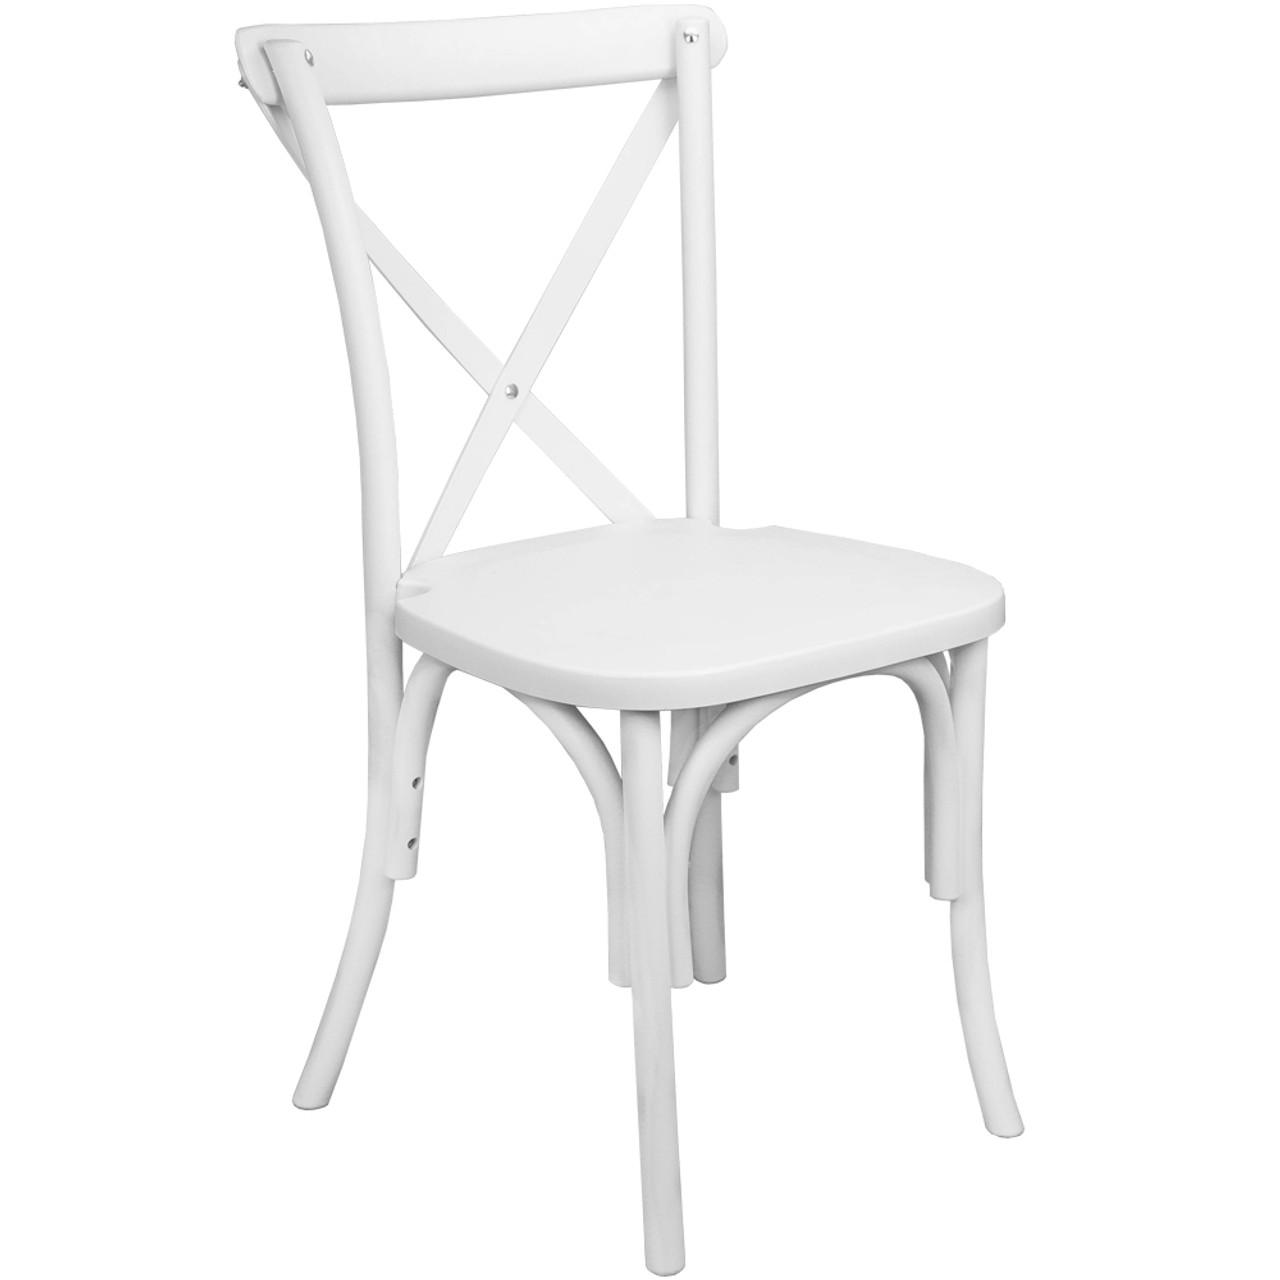 Miraculous Advantage White Resin X Back Chair Resxb White Creativecarmelina Interior Chair Design Creativecarmelinacom